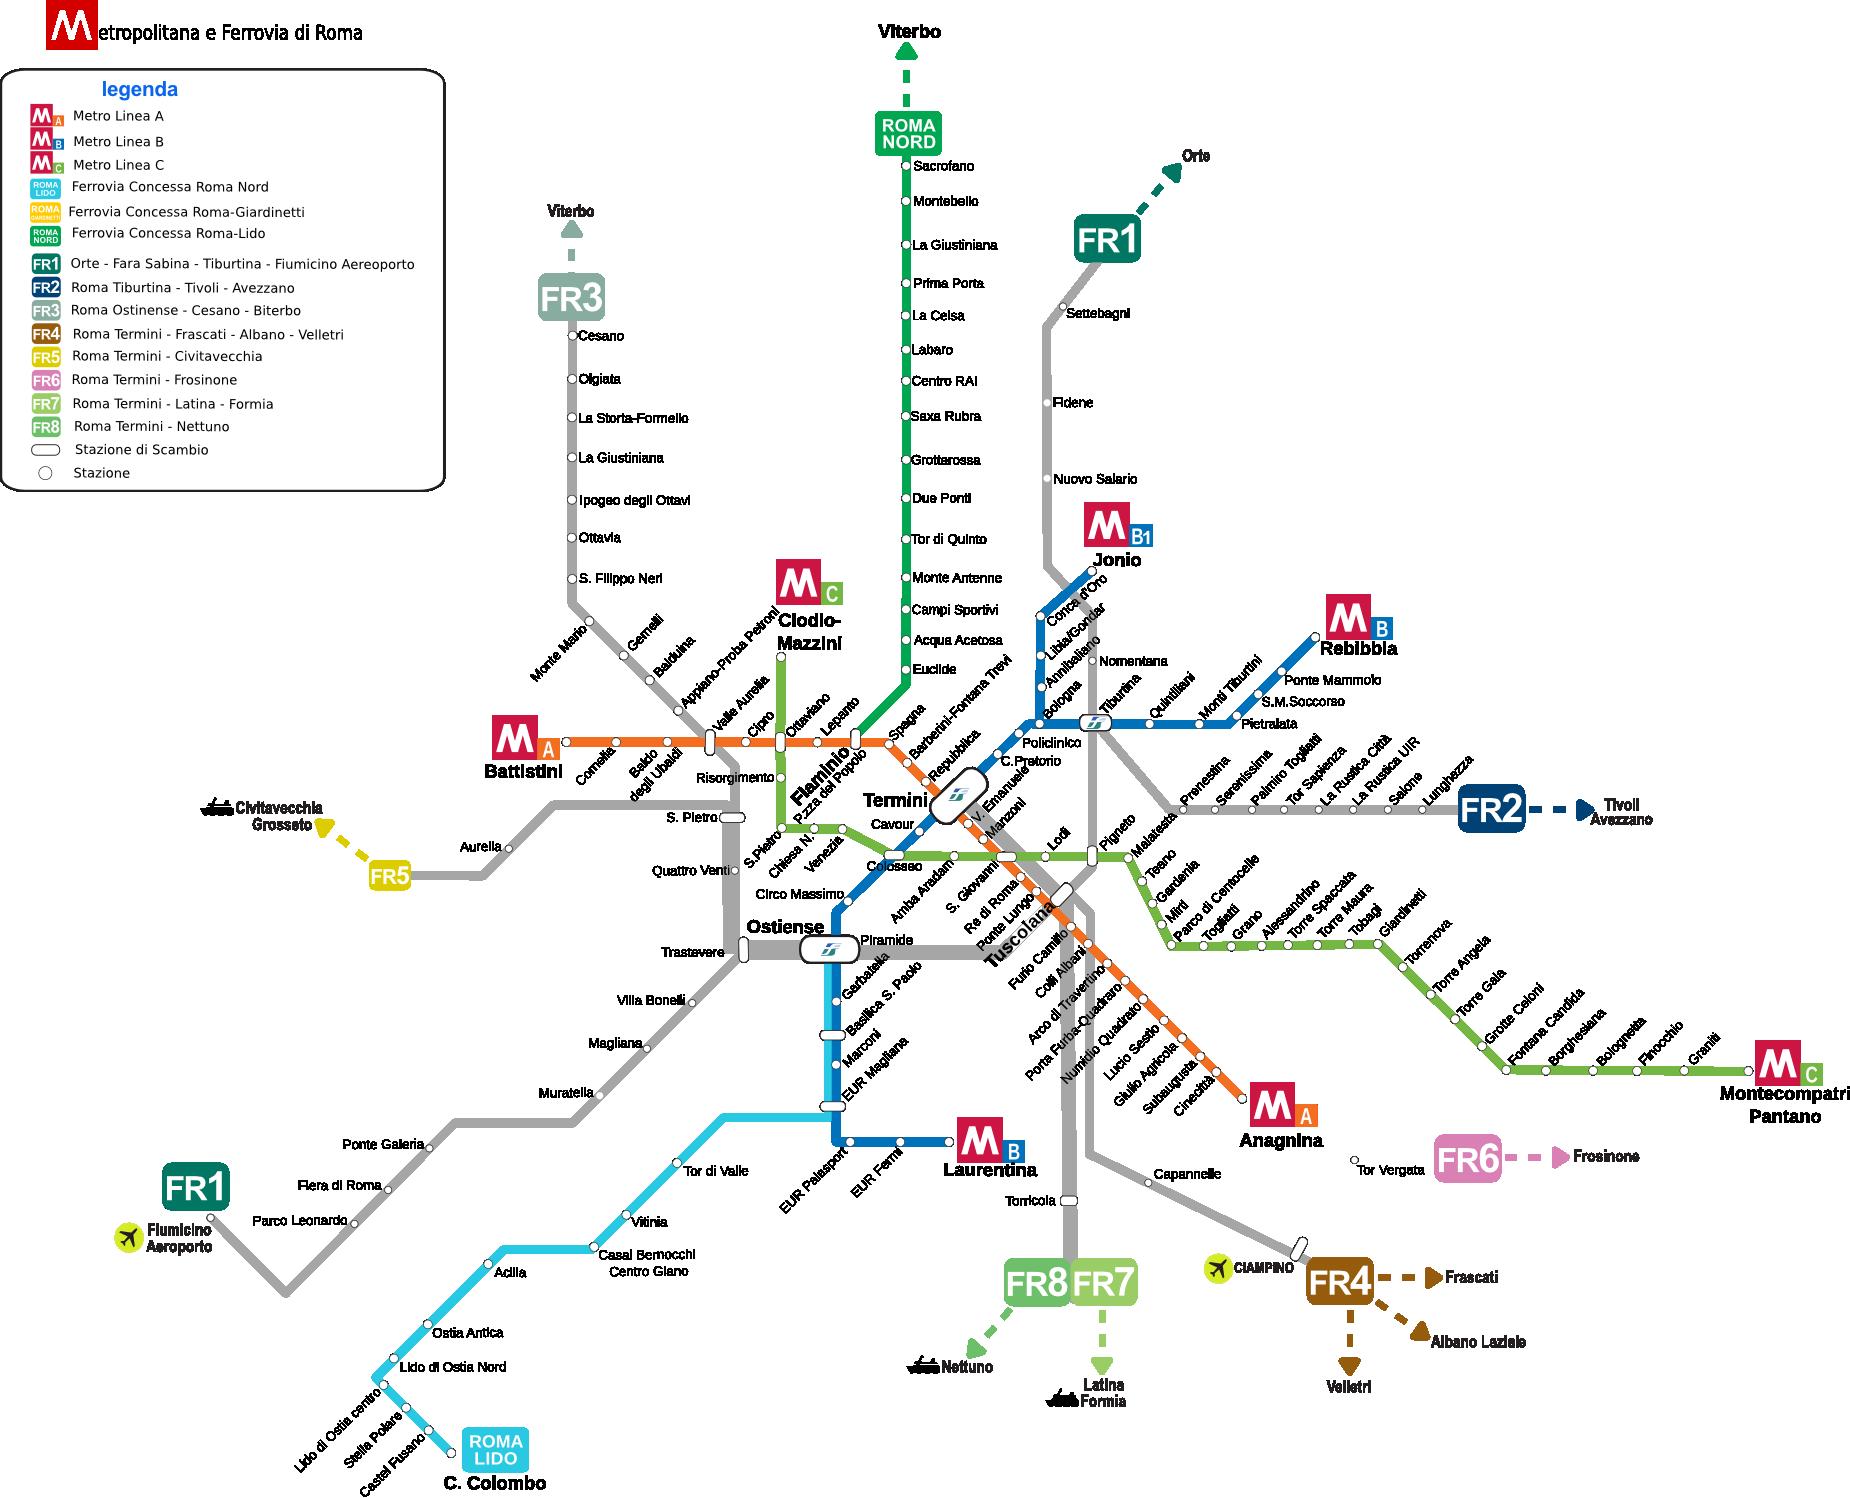 http://upload.wikimedia.org/wikipedia/commons/0/0b/Roma_Metropolitana_e_Ferrovia_2015.png